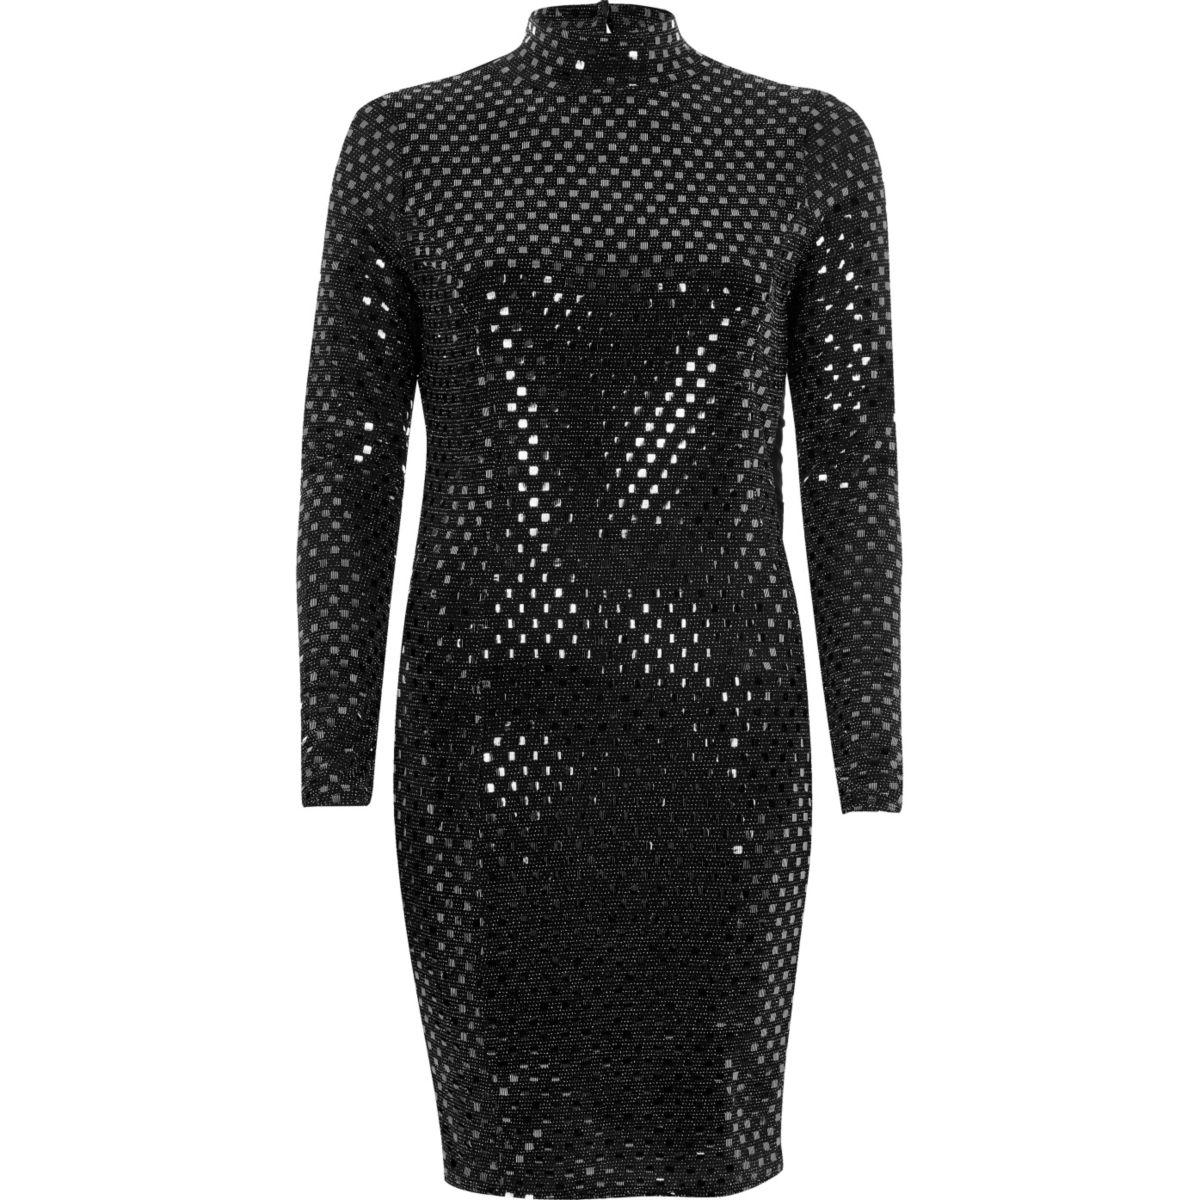 Metallic black turtleneck mini dress